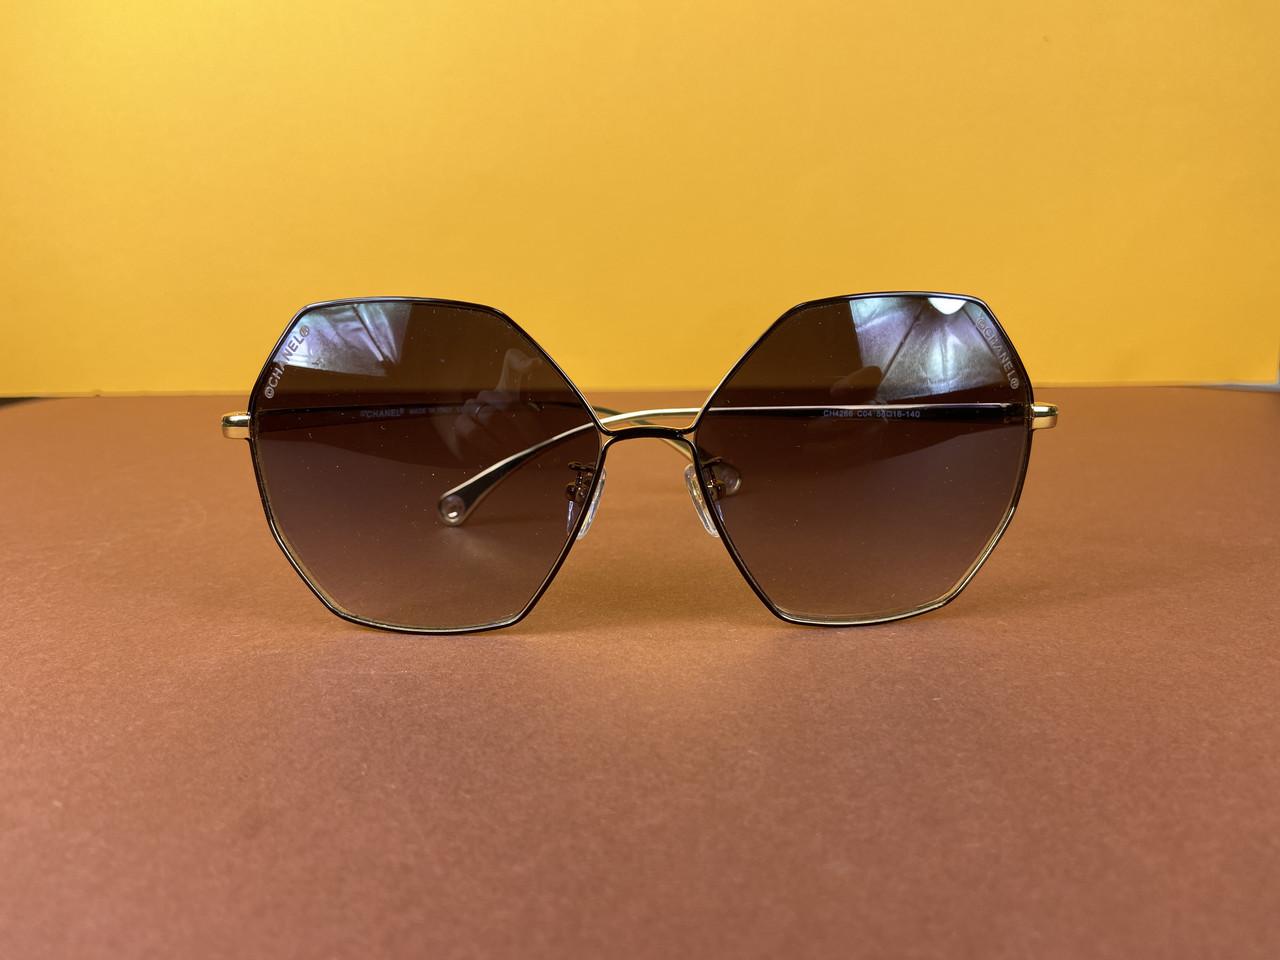 Солнцезащитные очки Chan*l 106-25, фото 1